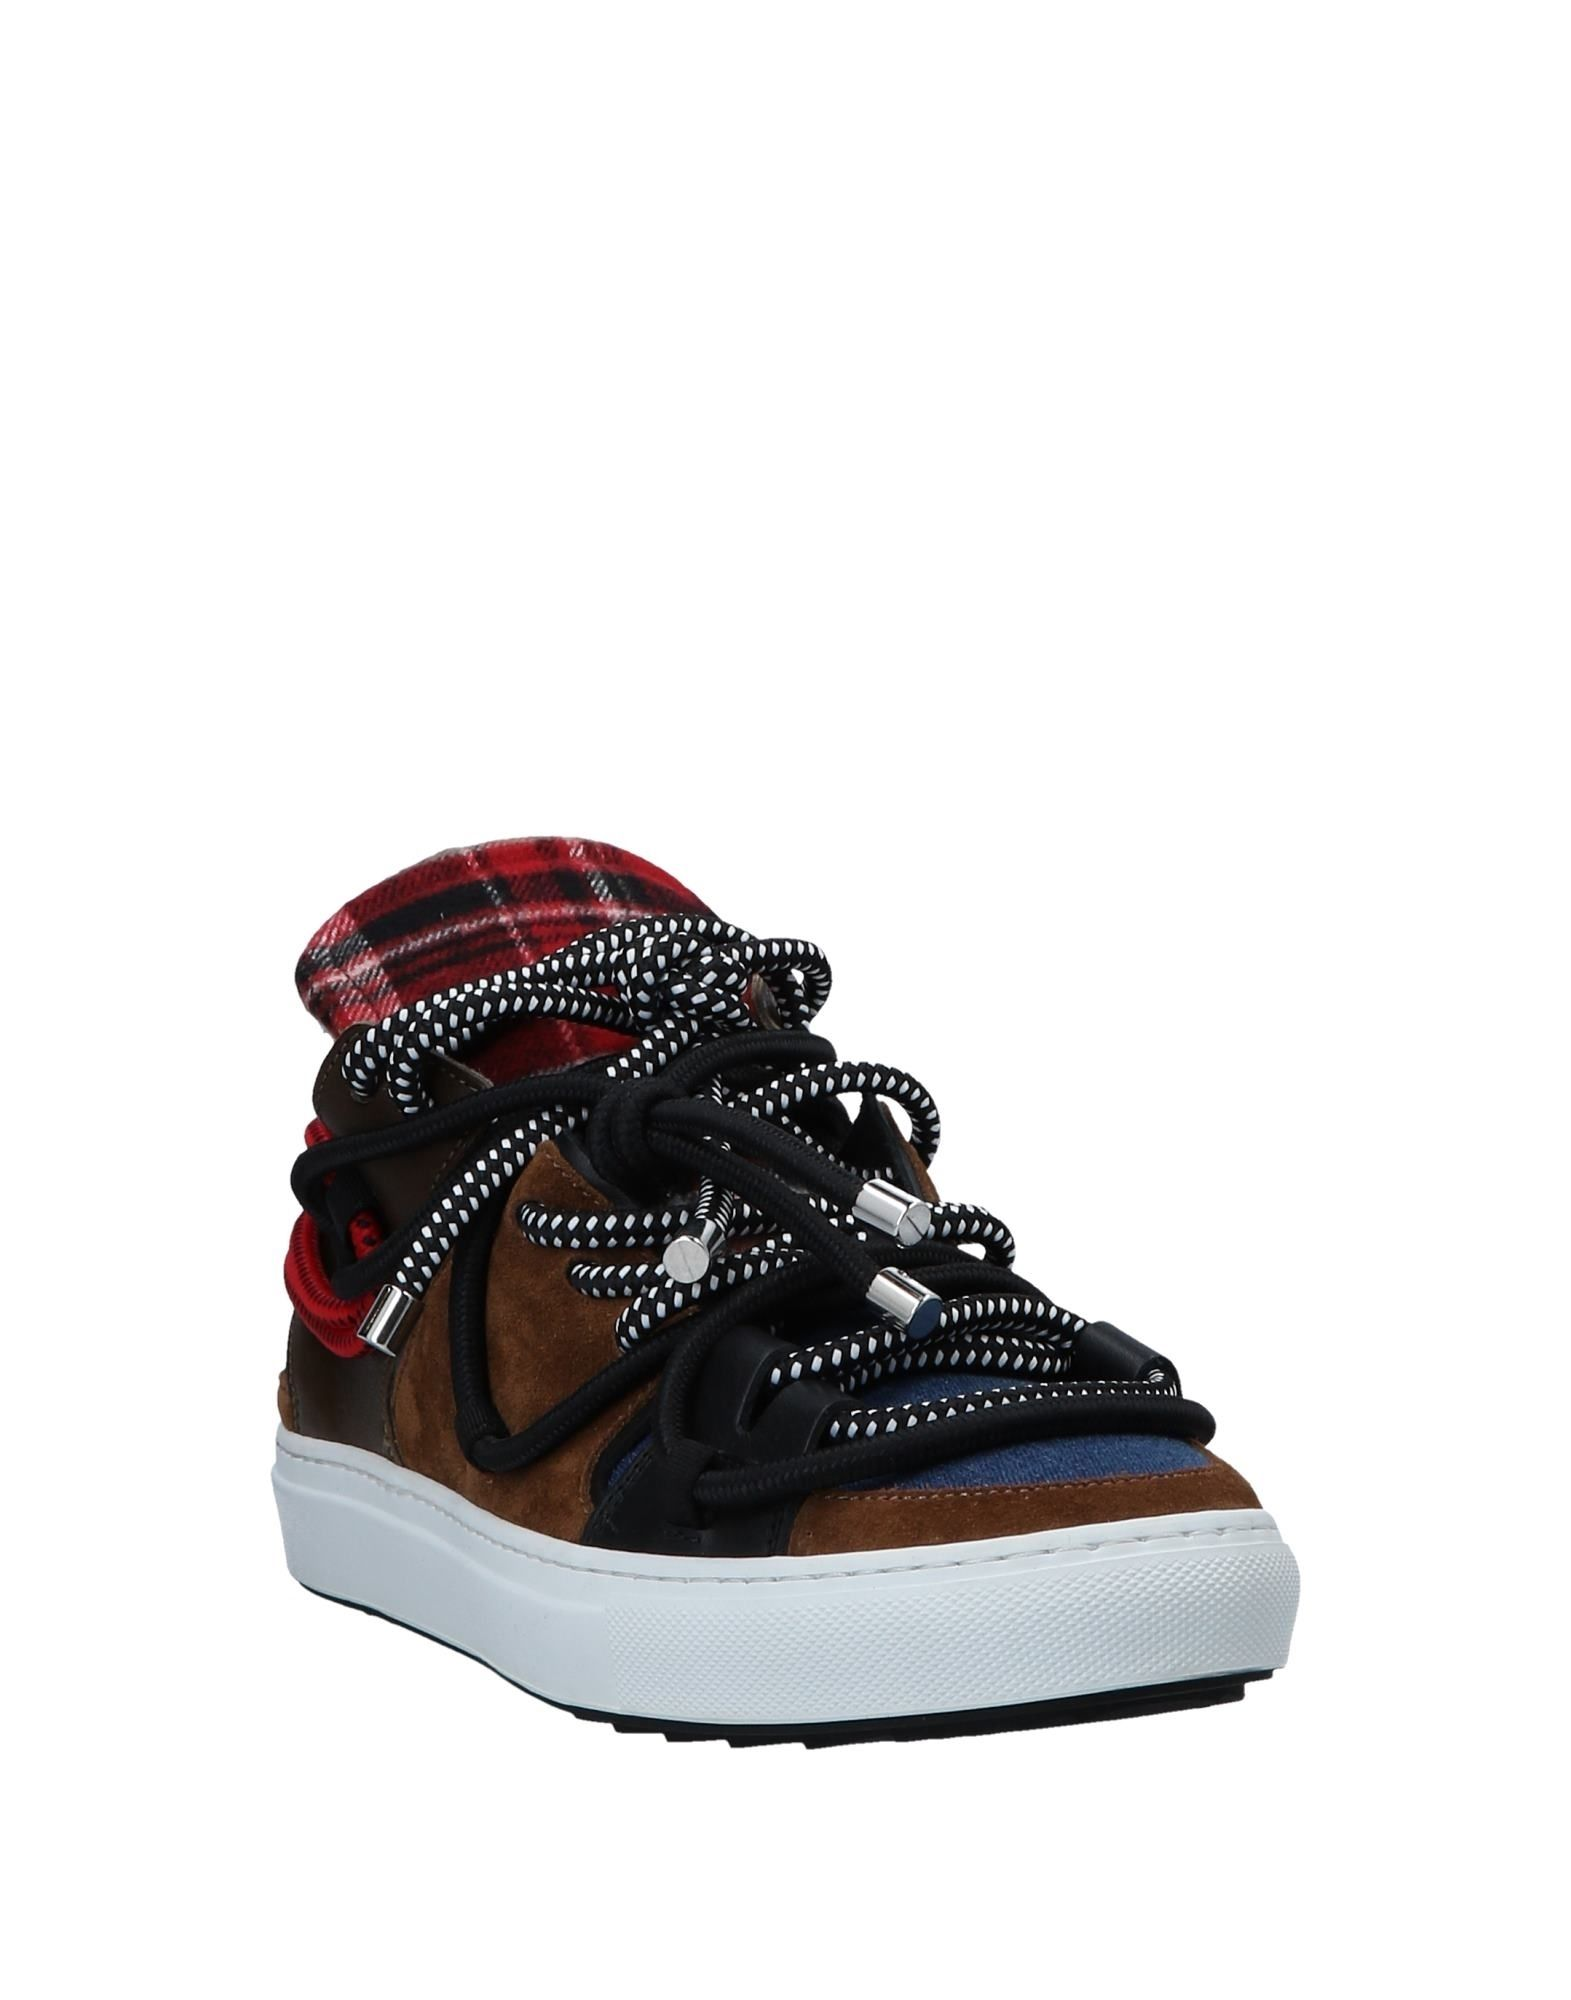 Dsquared2 Sneakers Herren  11554365NL Schuhe Gute Qualität beliebte Schuhe 11554365NL 06e0f1